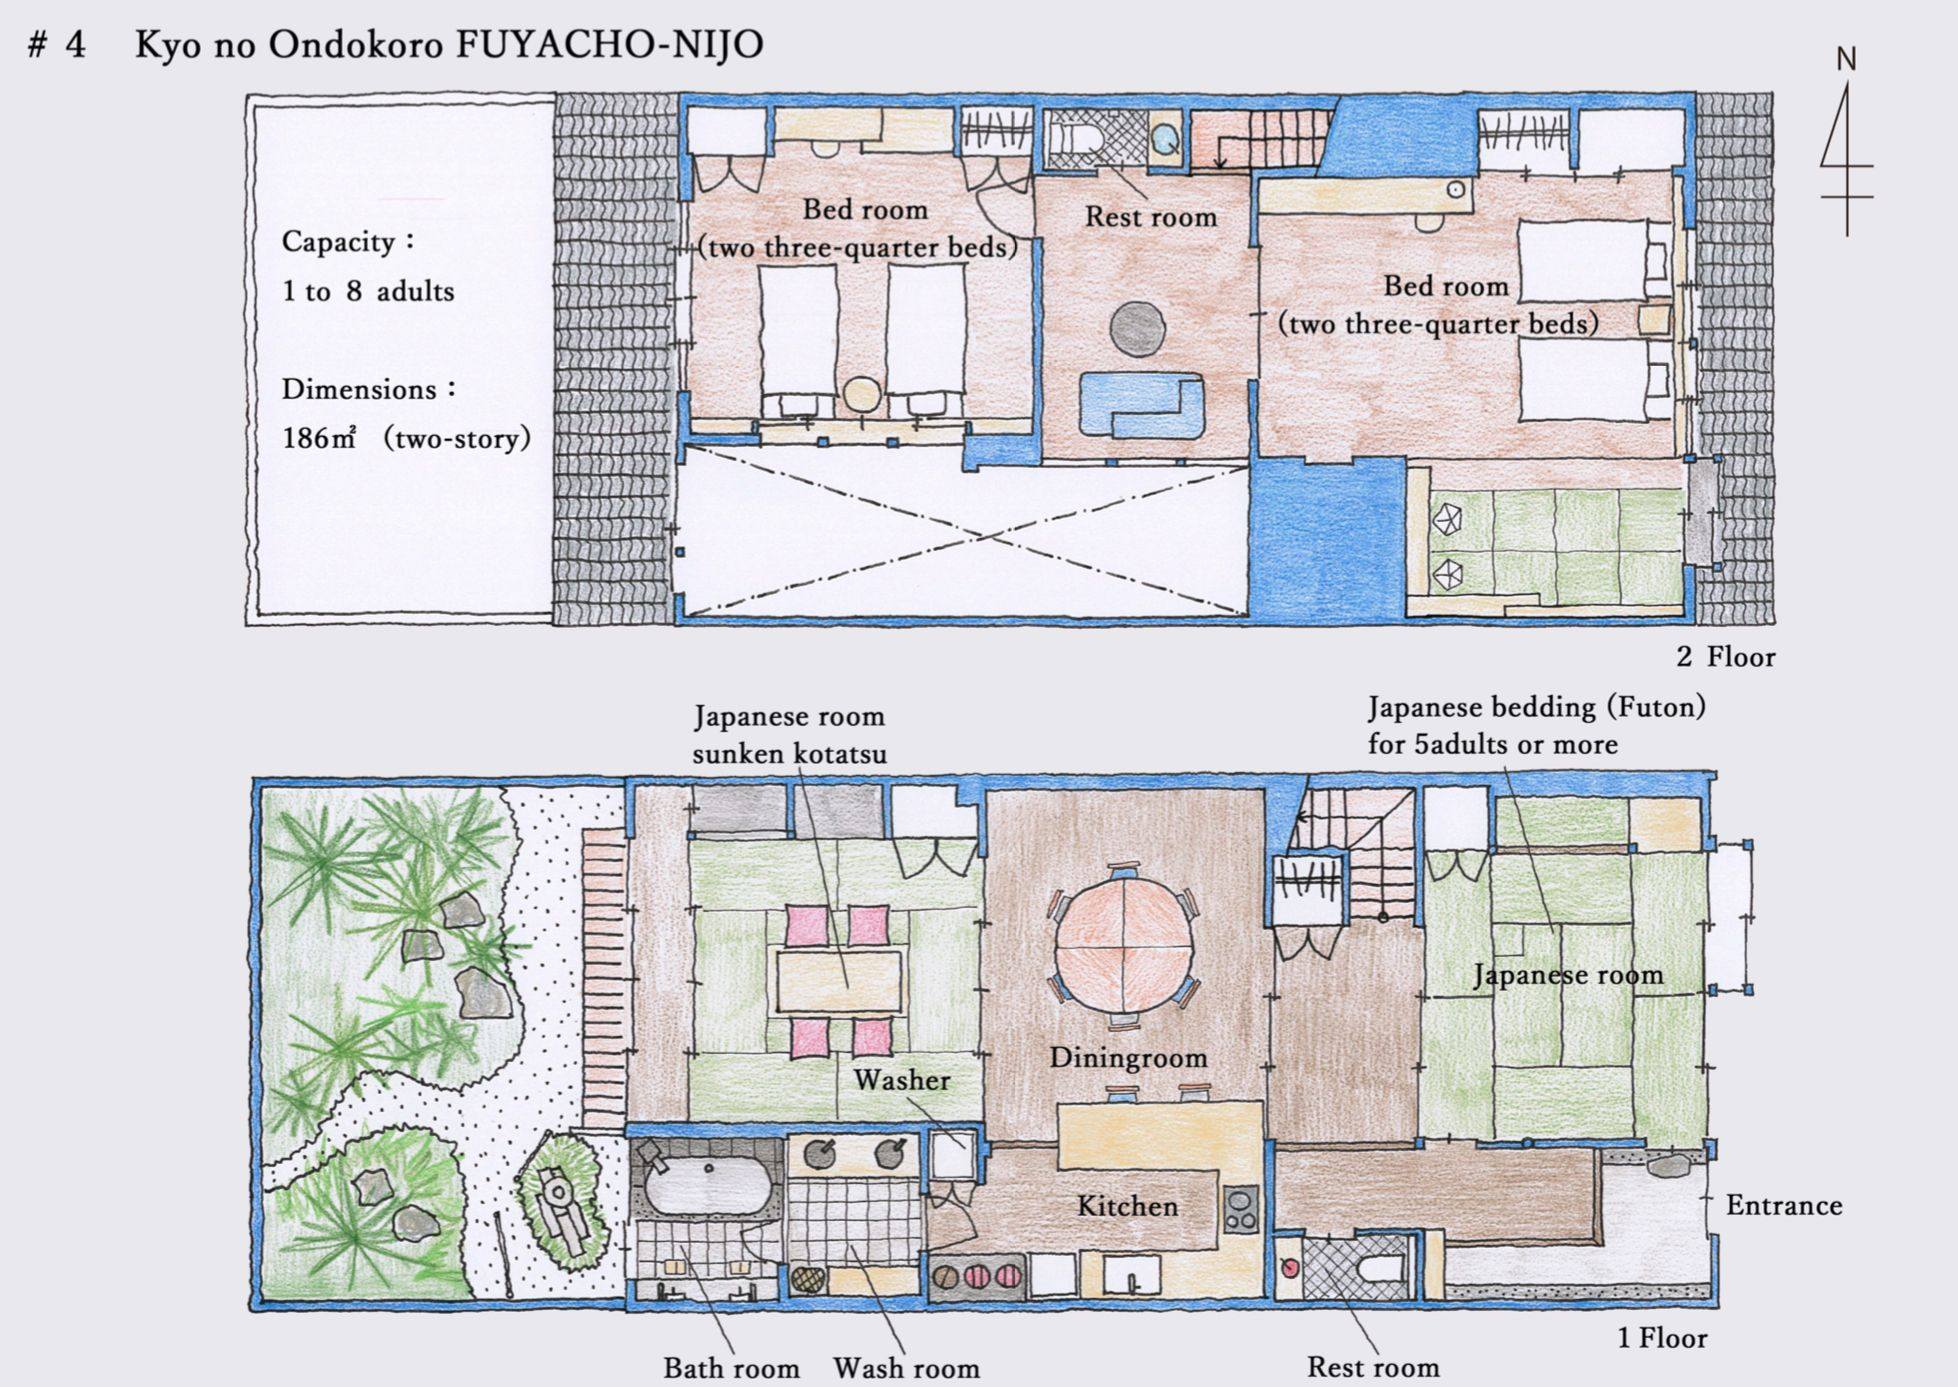 Kyo No Ondokoro Fuyacho Nijo Kyo Machiya Townhouse L Accommodation Of Wacoal Corp Sims House Plans Sims 4 House Plans Townhouse Exterior